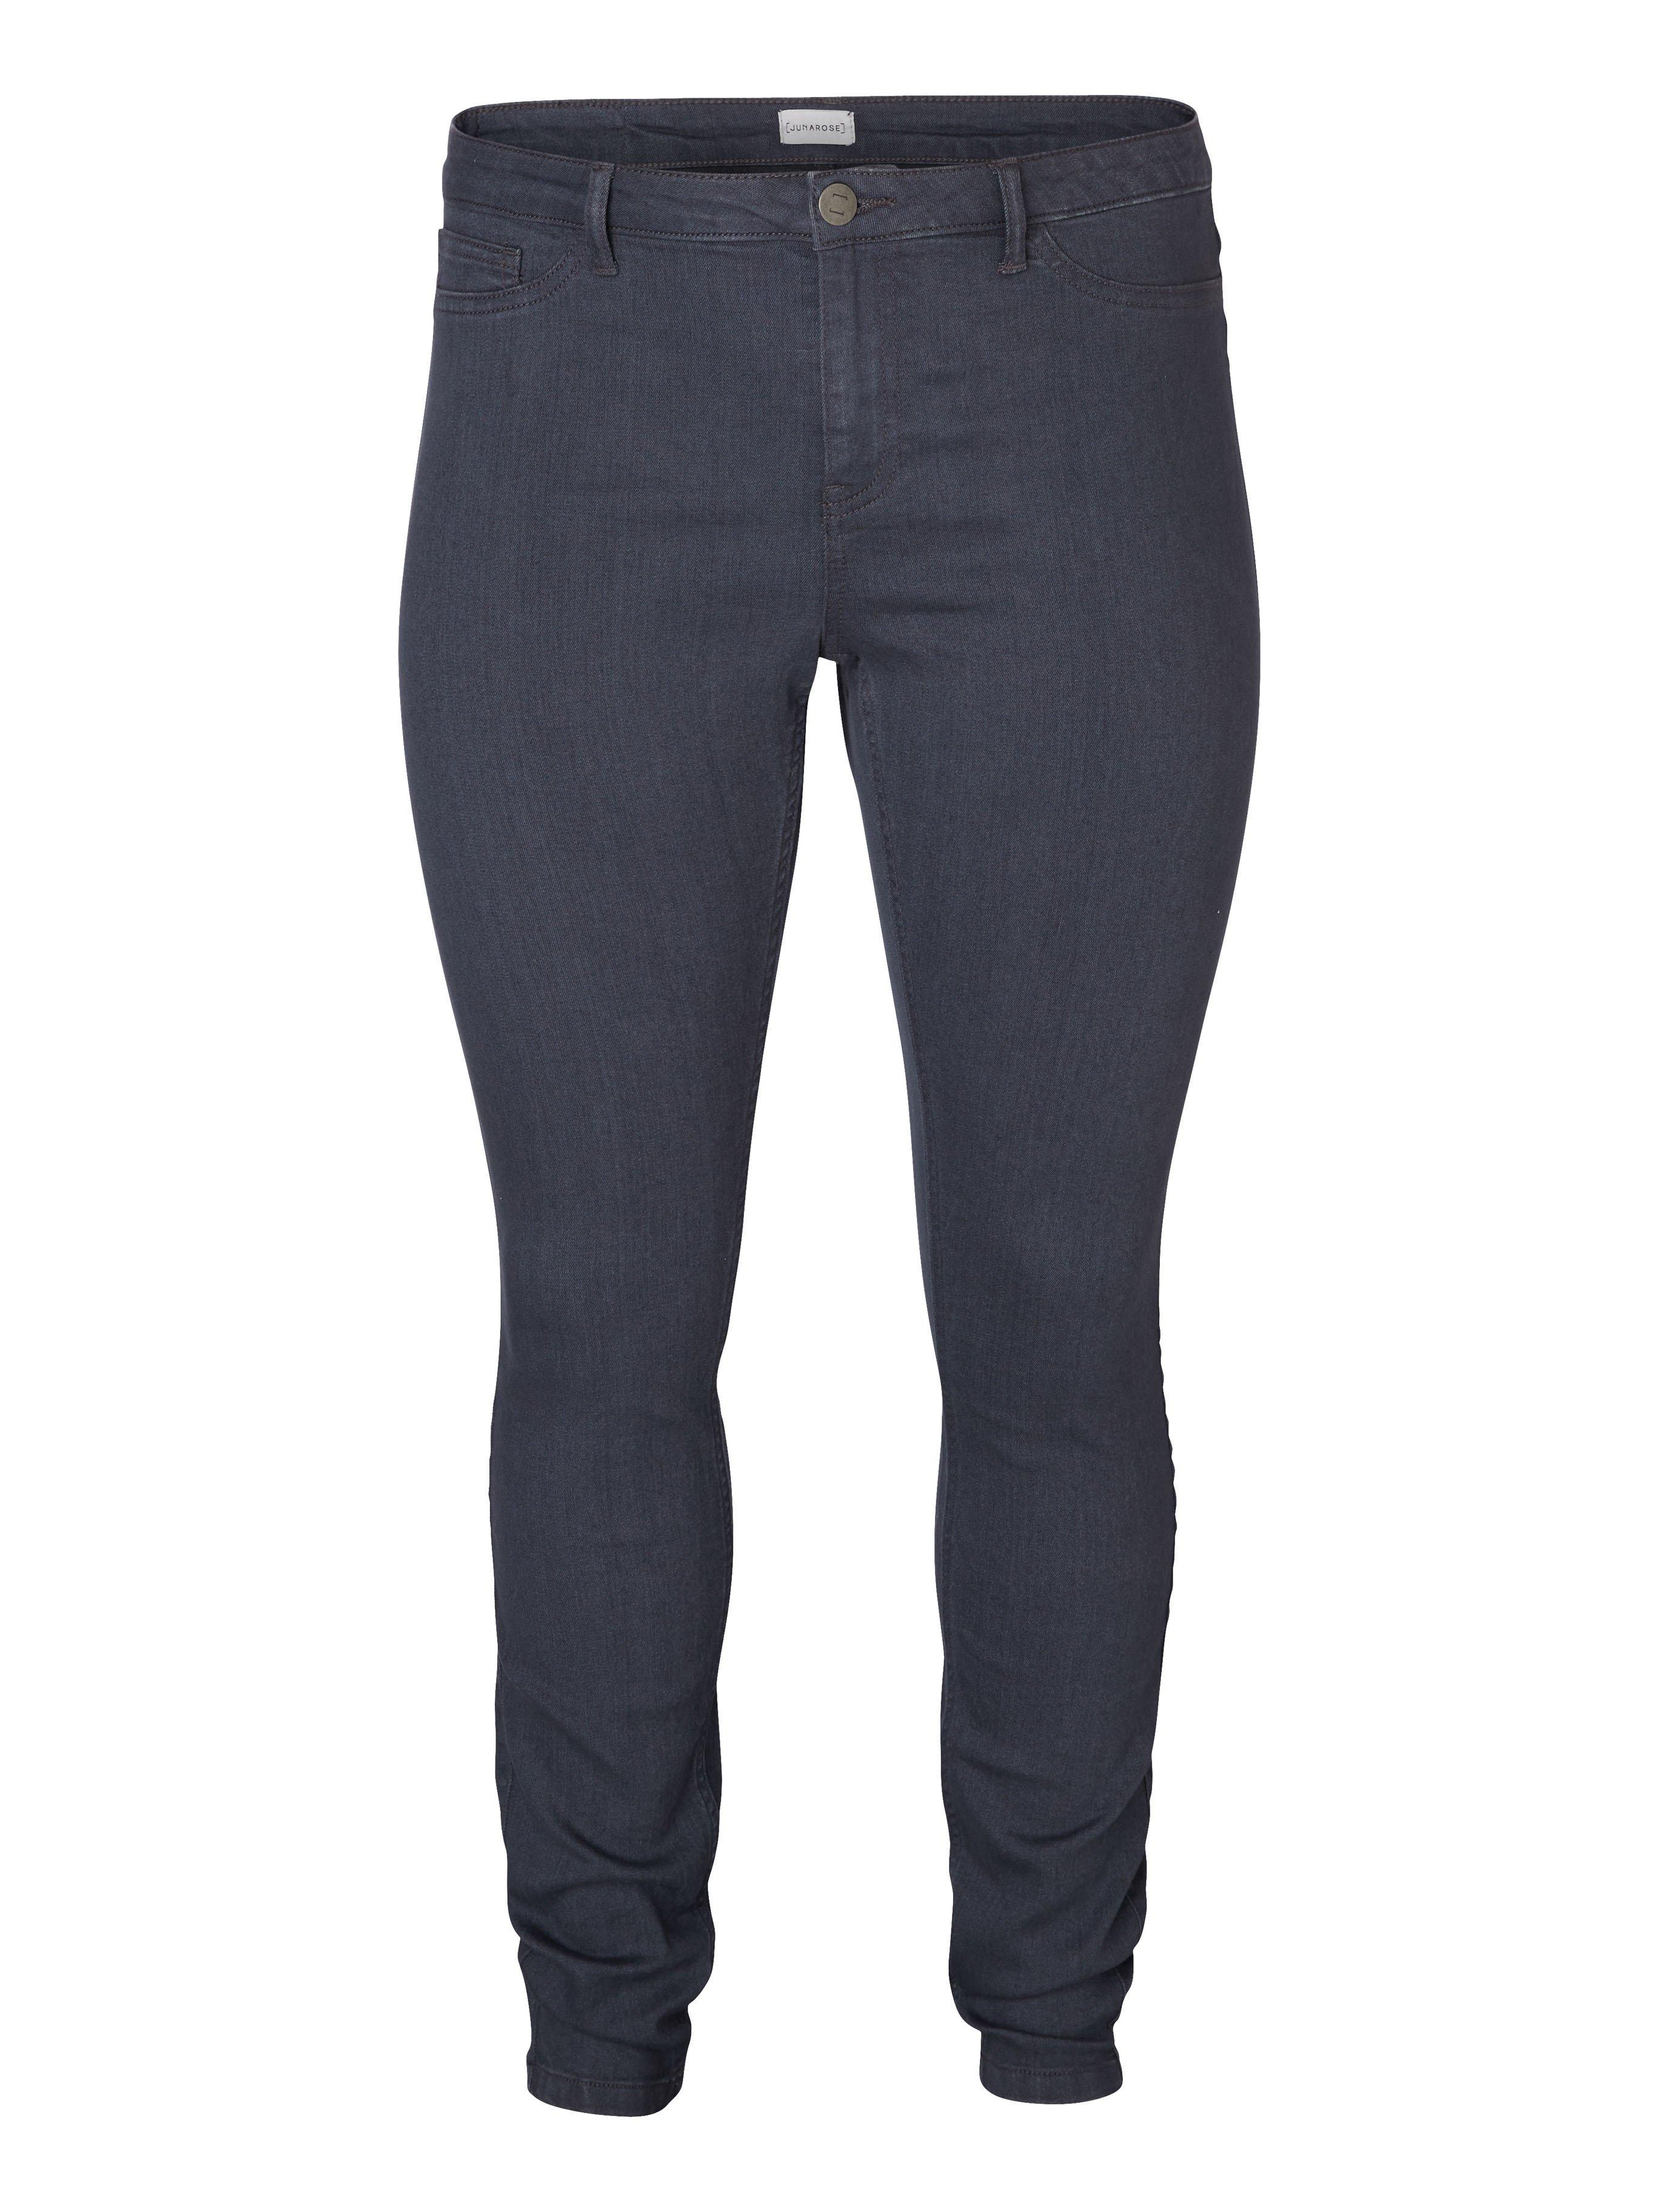 Mørke Grå Queen Jeans